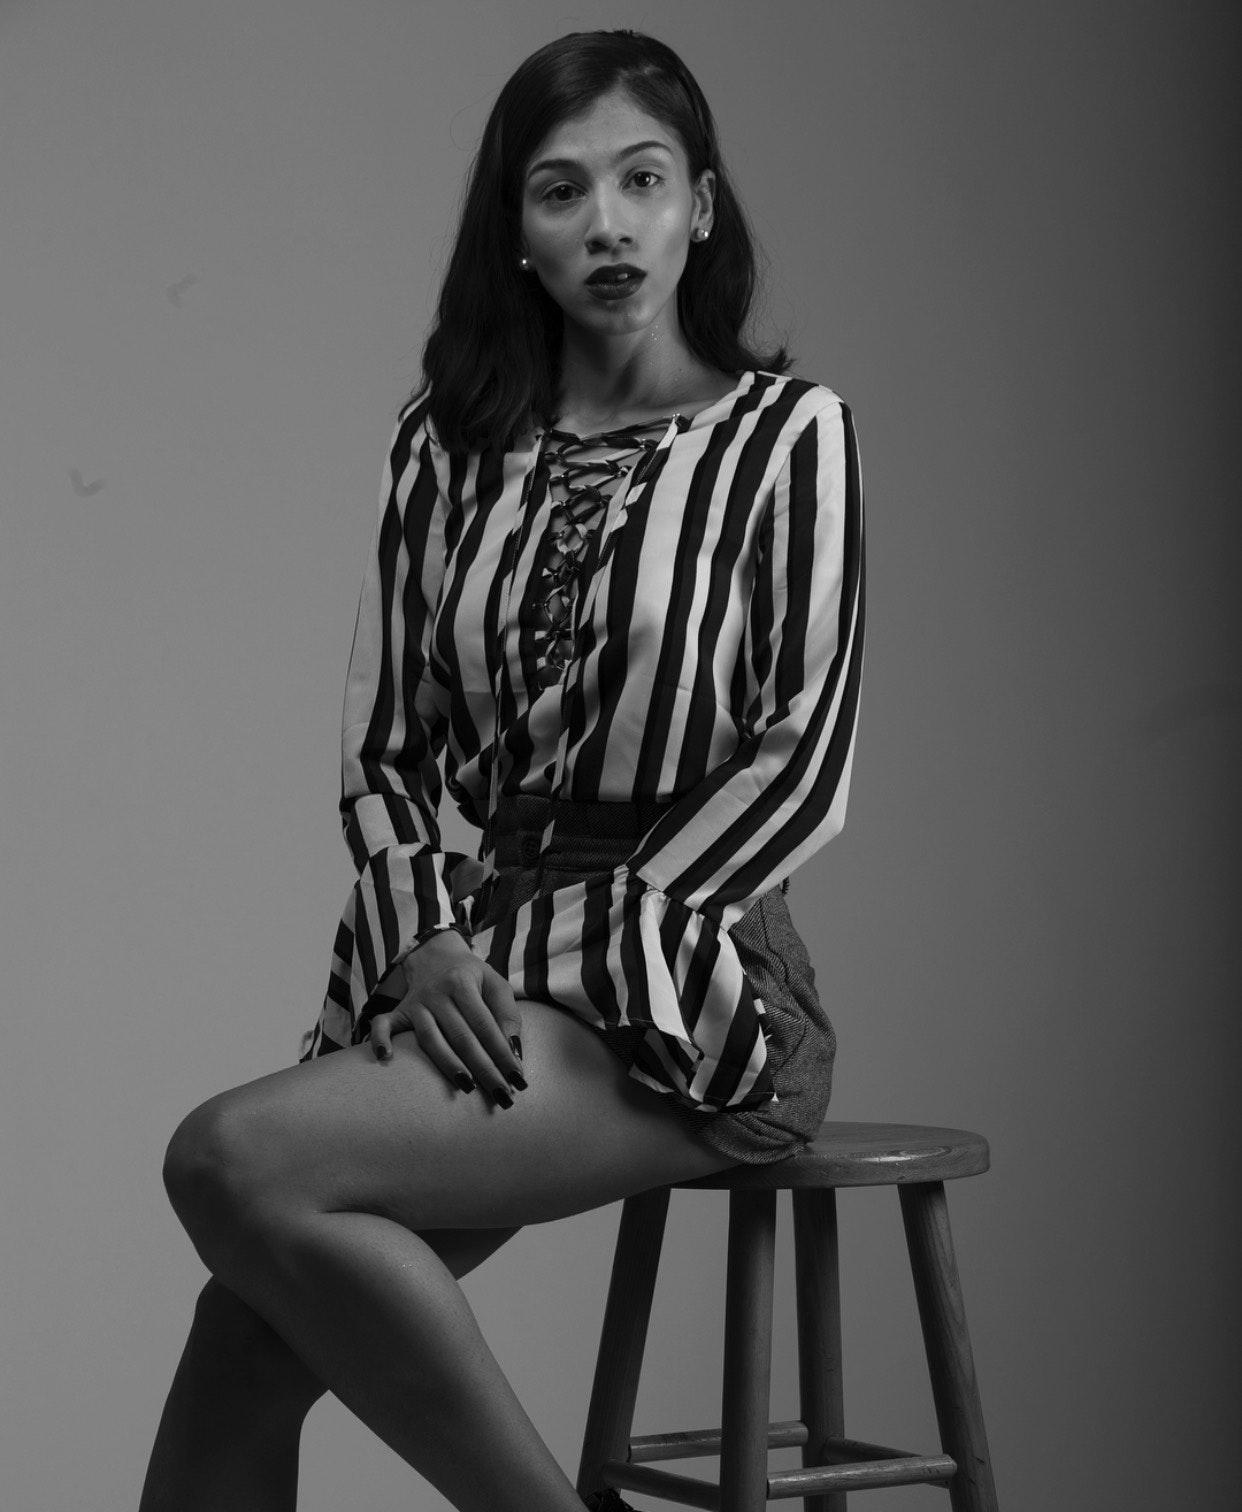 Nathysha's Model portfolio